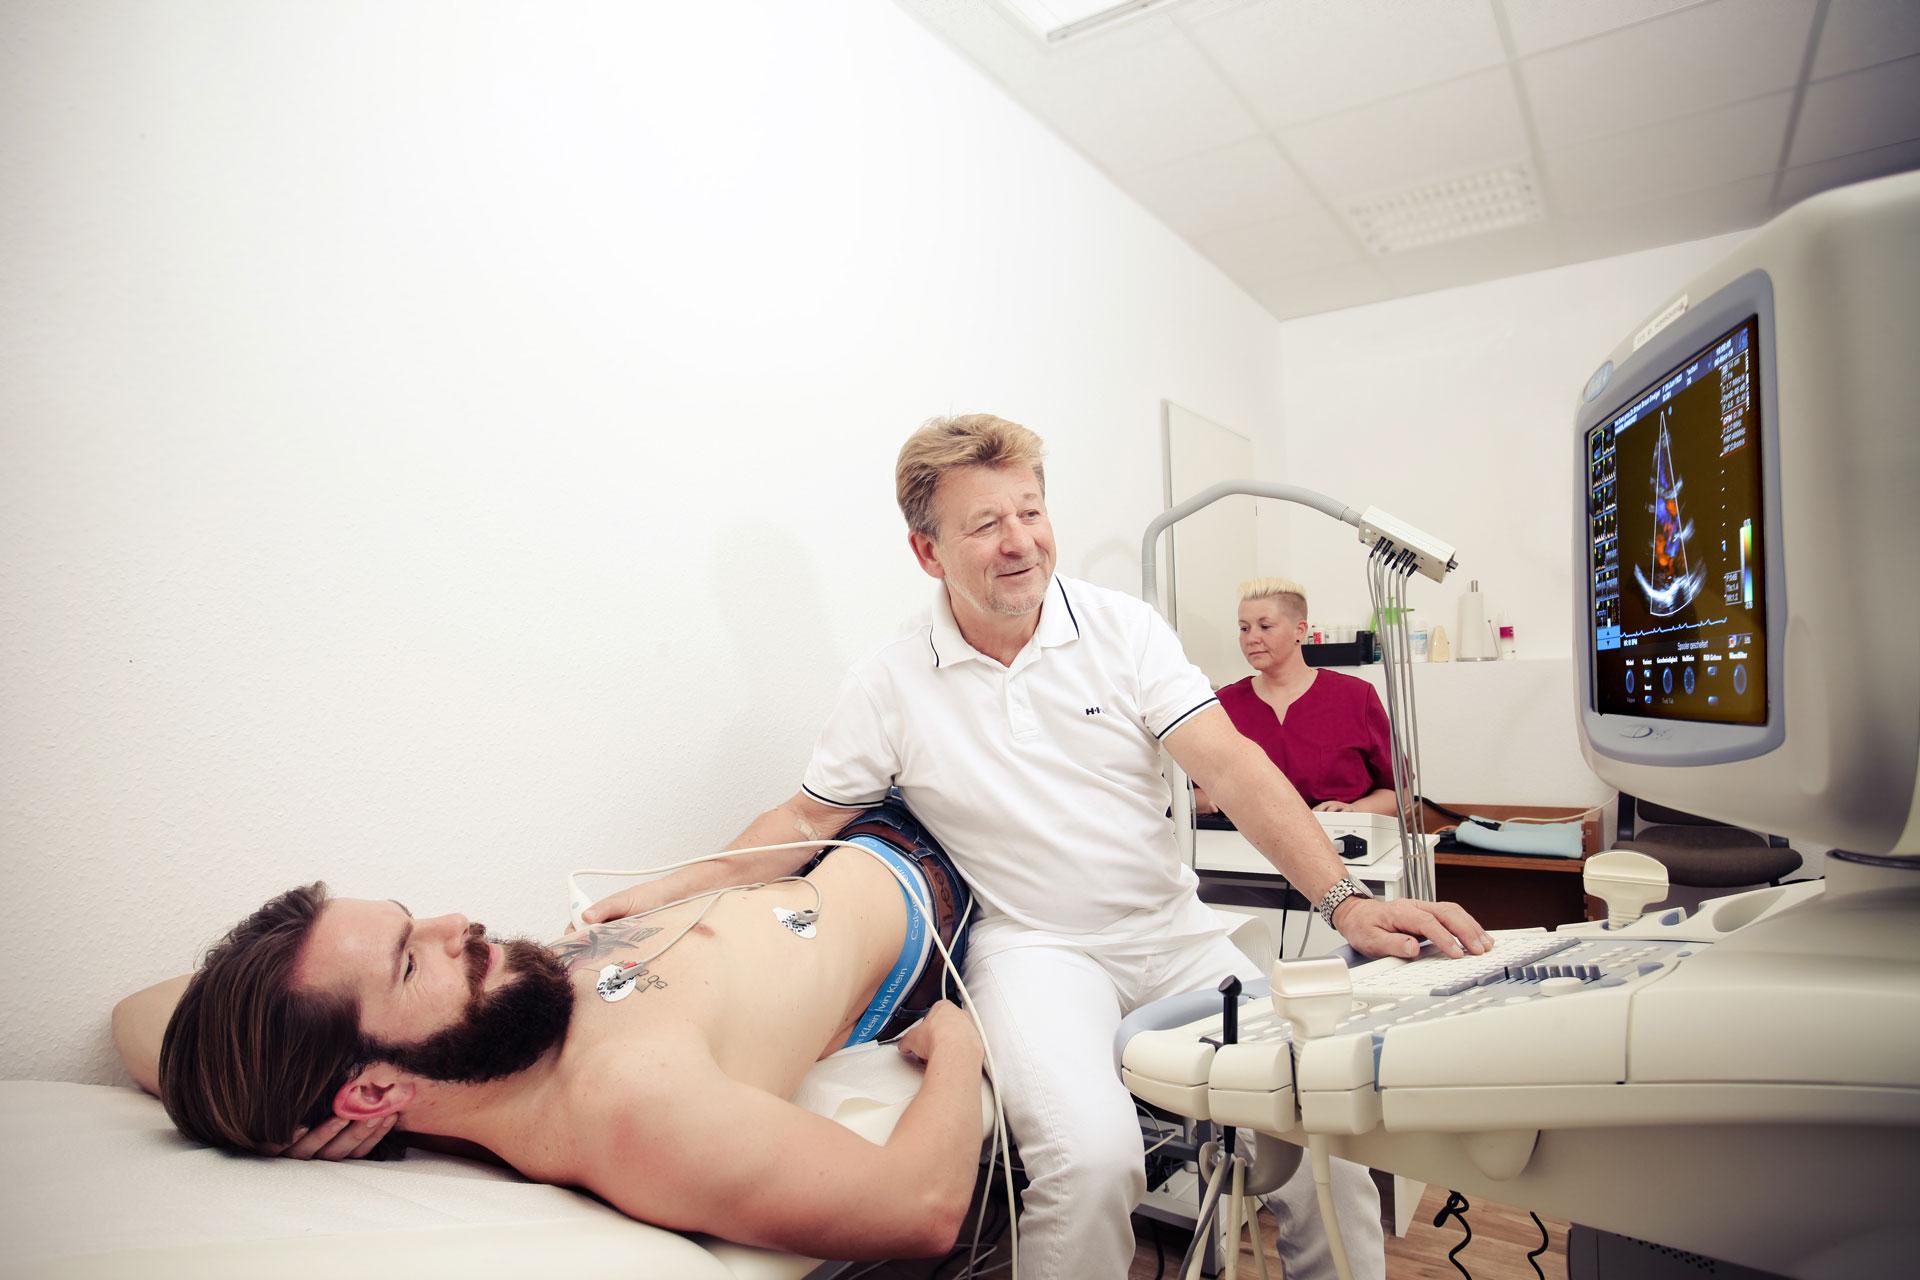 Kardiologie, Angiologie, Untersuchung